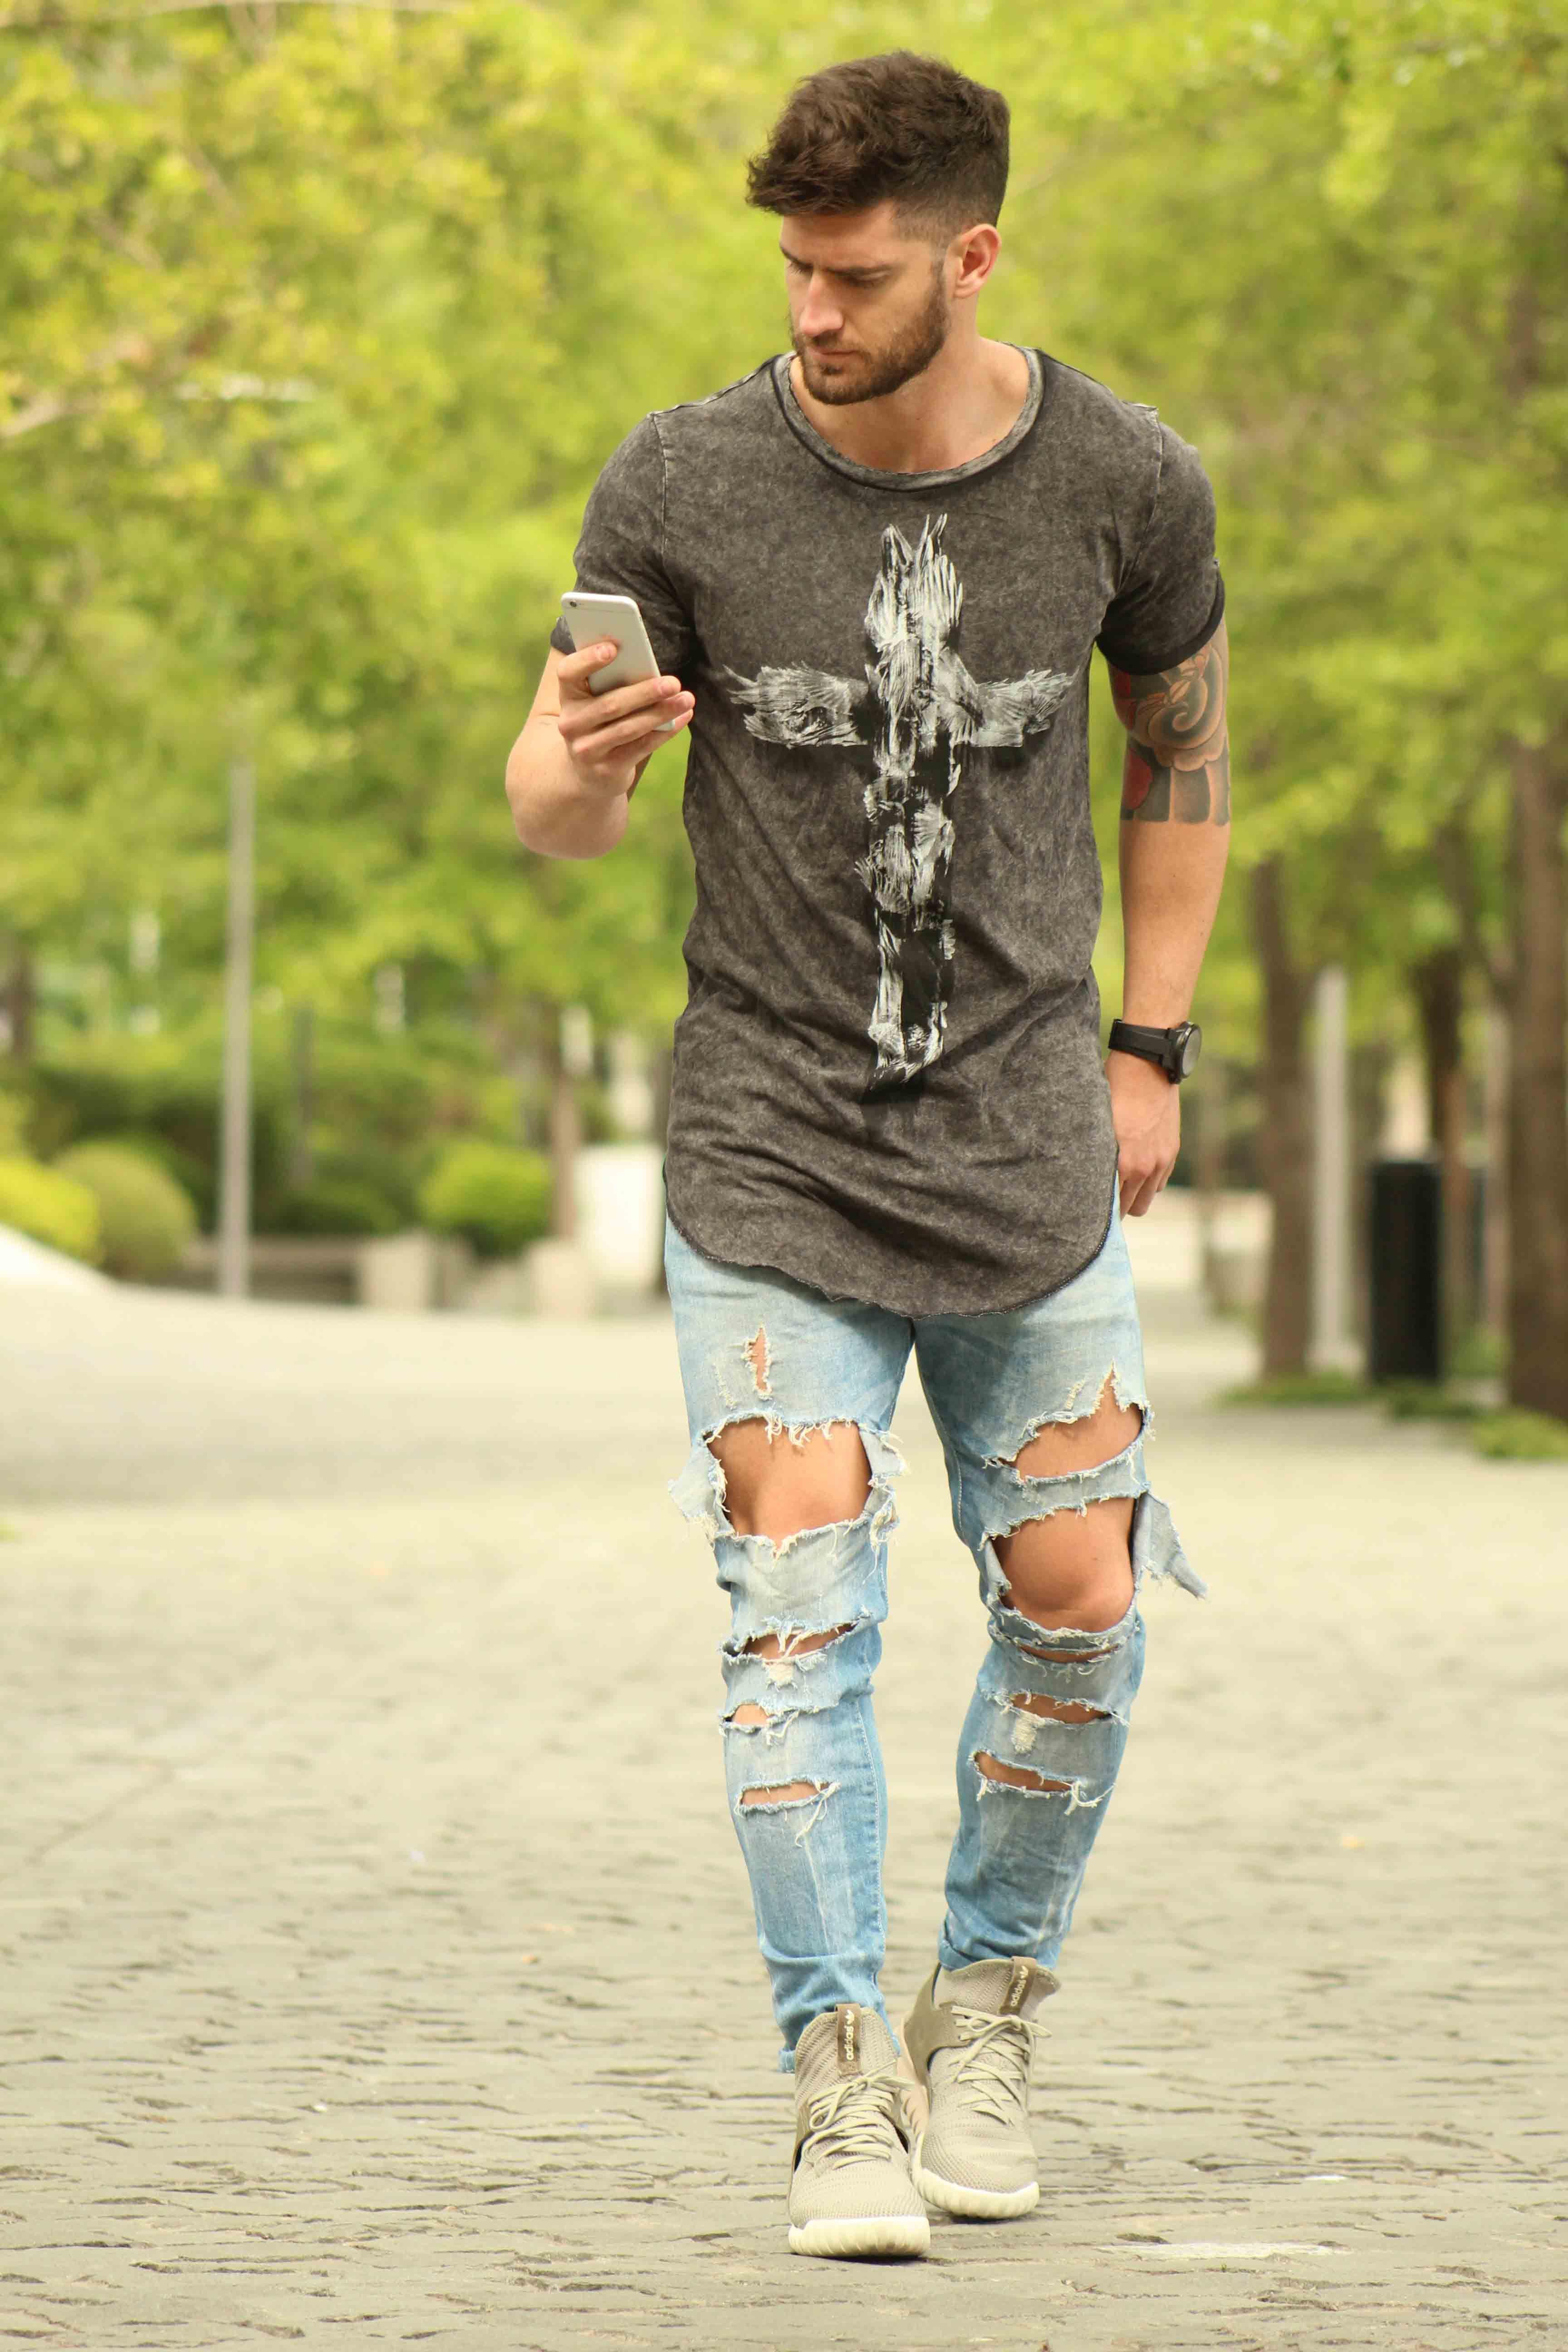 un look muy casual con jeans desgastados style pinterest stile f r m nner hertha und. Black Bedroom Furniture Sets. Home Design Ideas